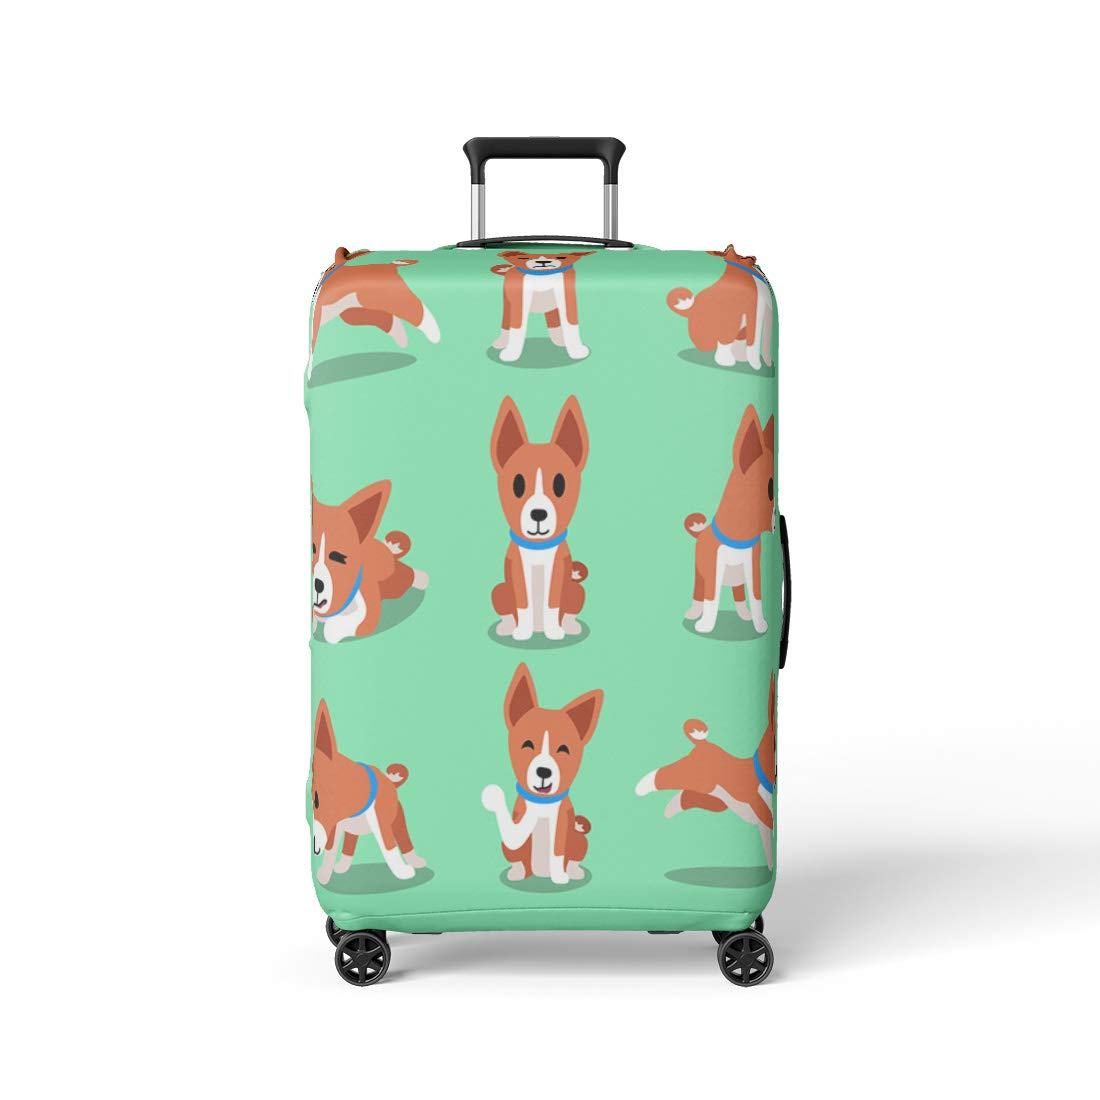 81a875f8c6ae Amazon.com: Semtomn Luggage Cover Puppy Cartoon Character Basenji ...